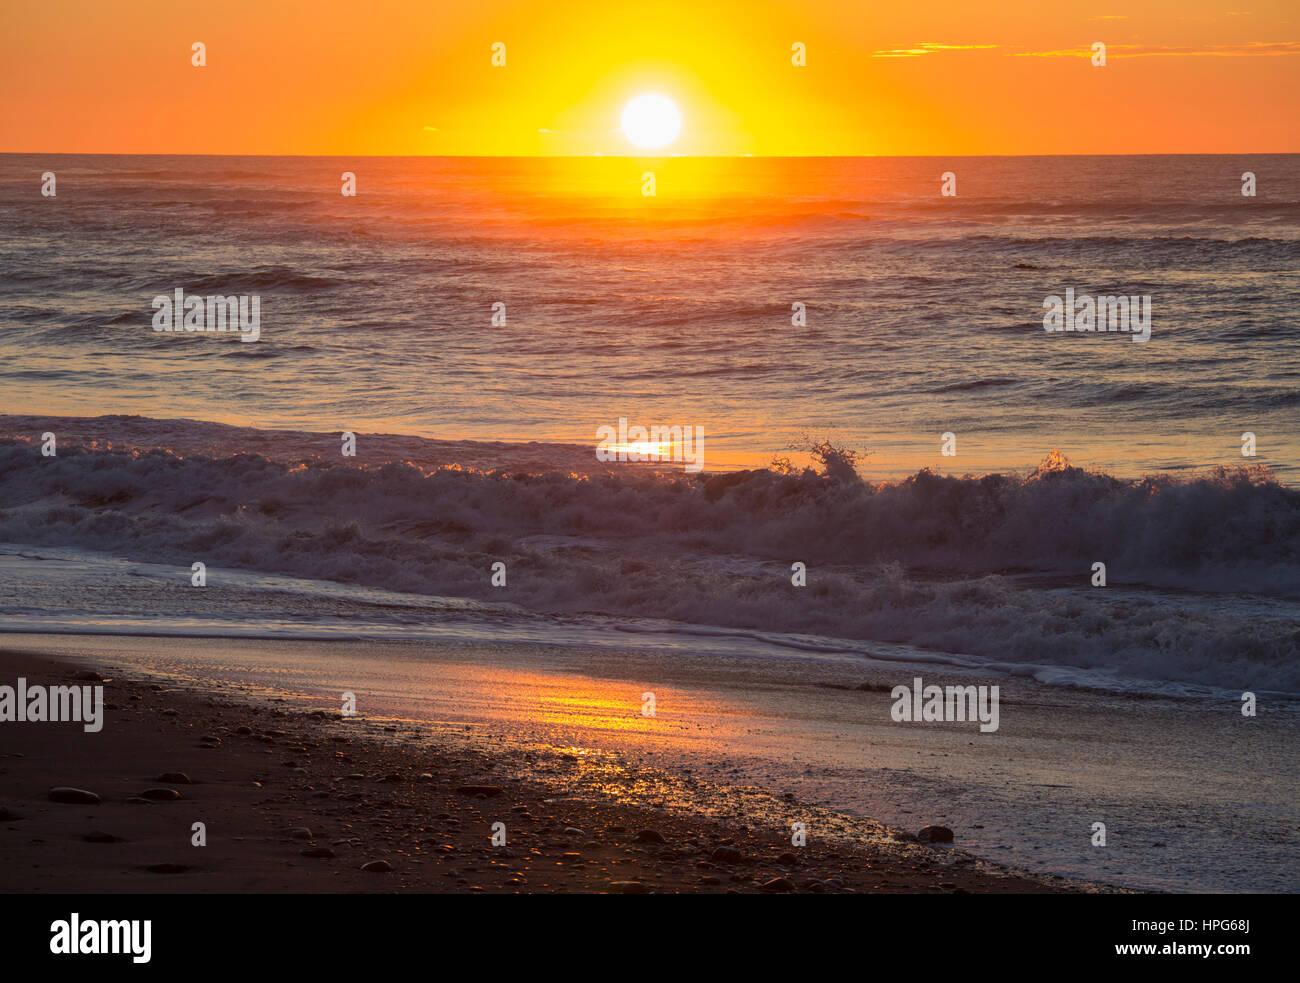 Okarito, Westland Tai Poutini Nationalpark, West Coast, New Zealand. Goldener Sonnenuntergang über der Tasmansee. Stockfoto